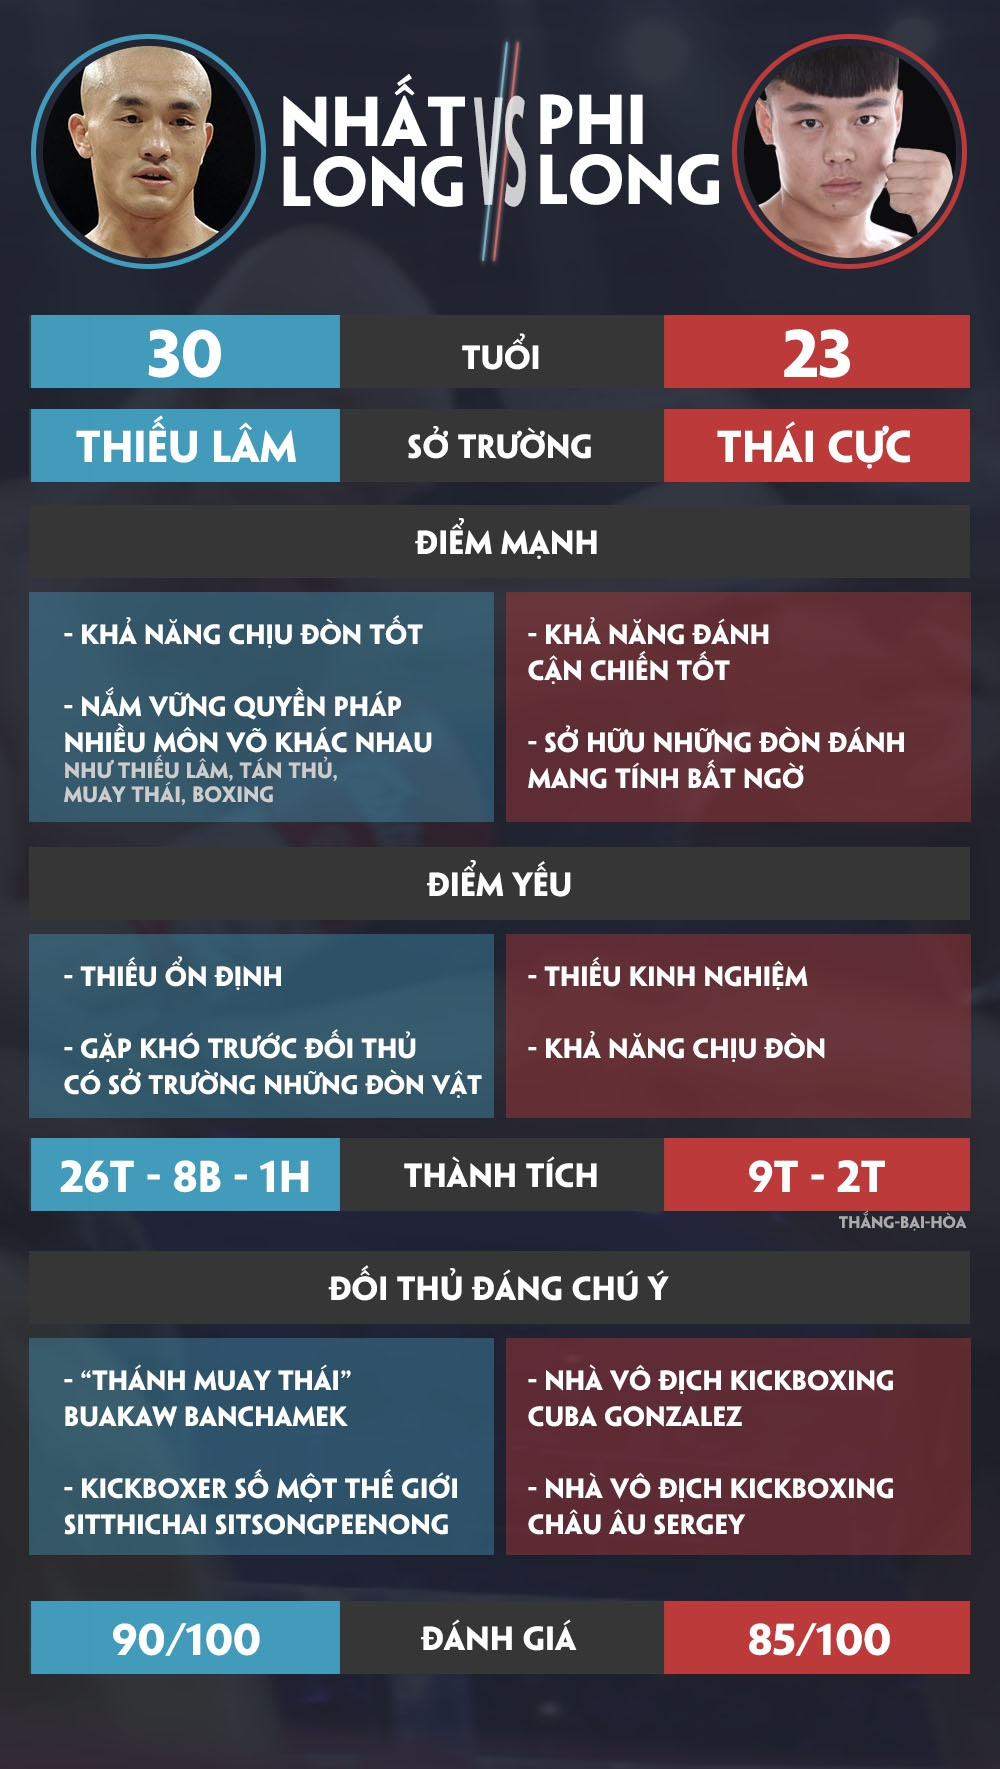 De nhat Thieu Lam va De nhat Thai Cuc: Vo cong ai gioi hon? hinh anh 3